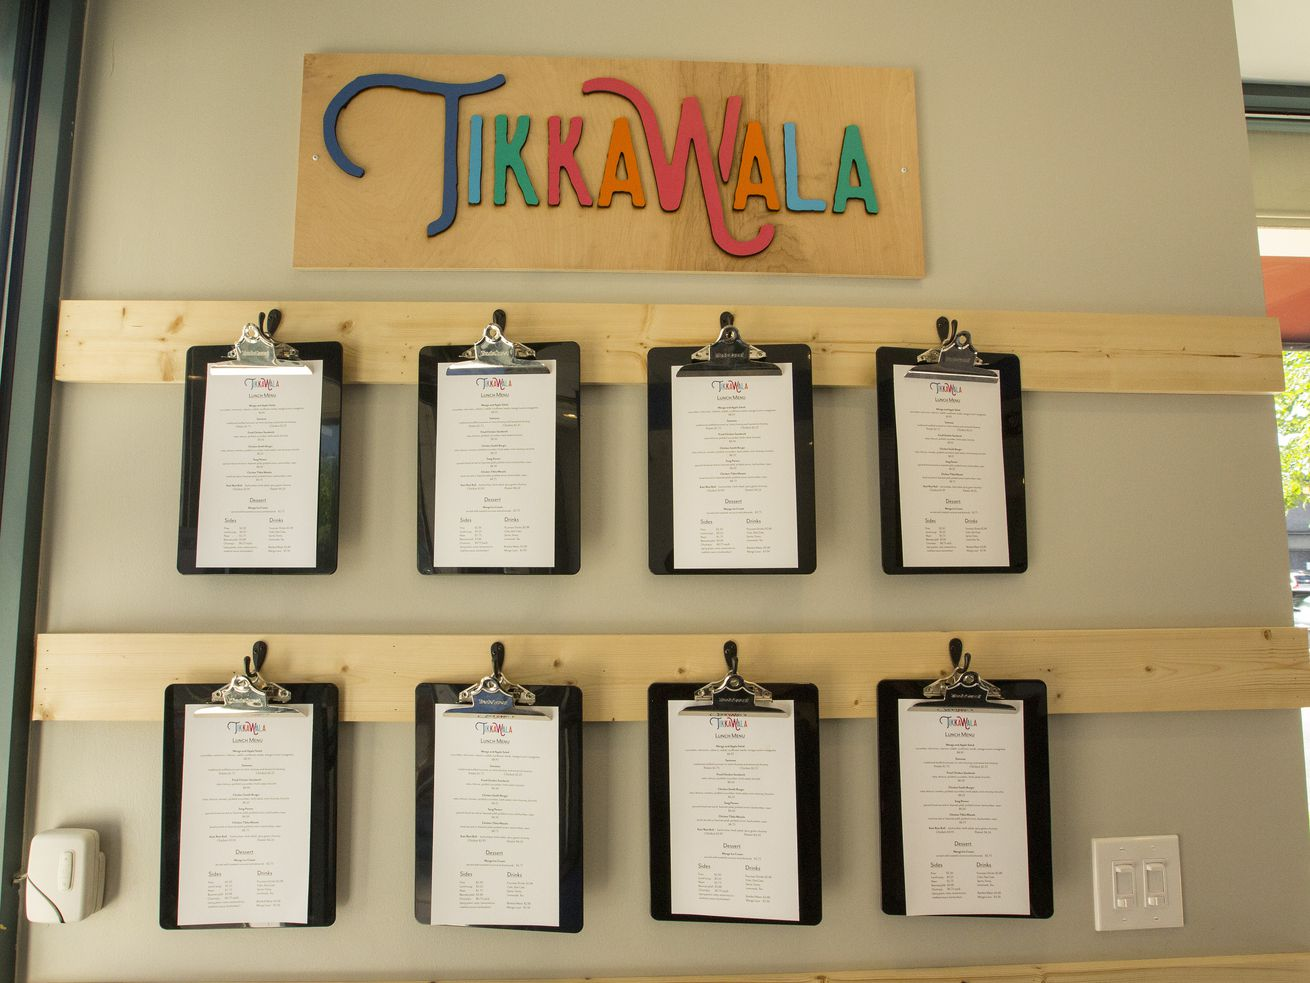 Tikkawala